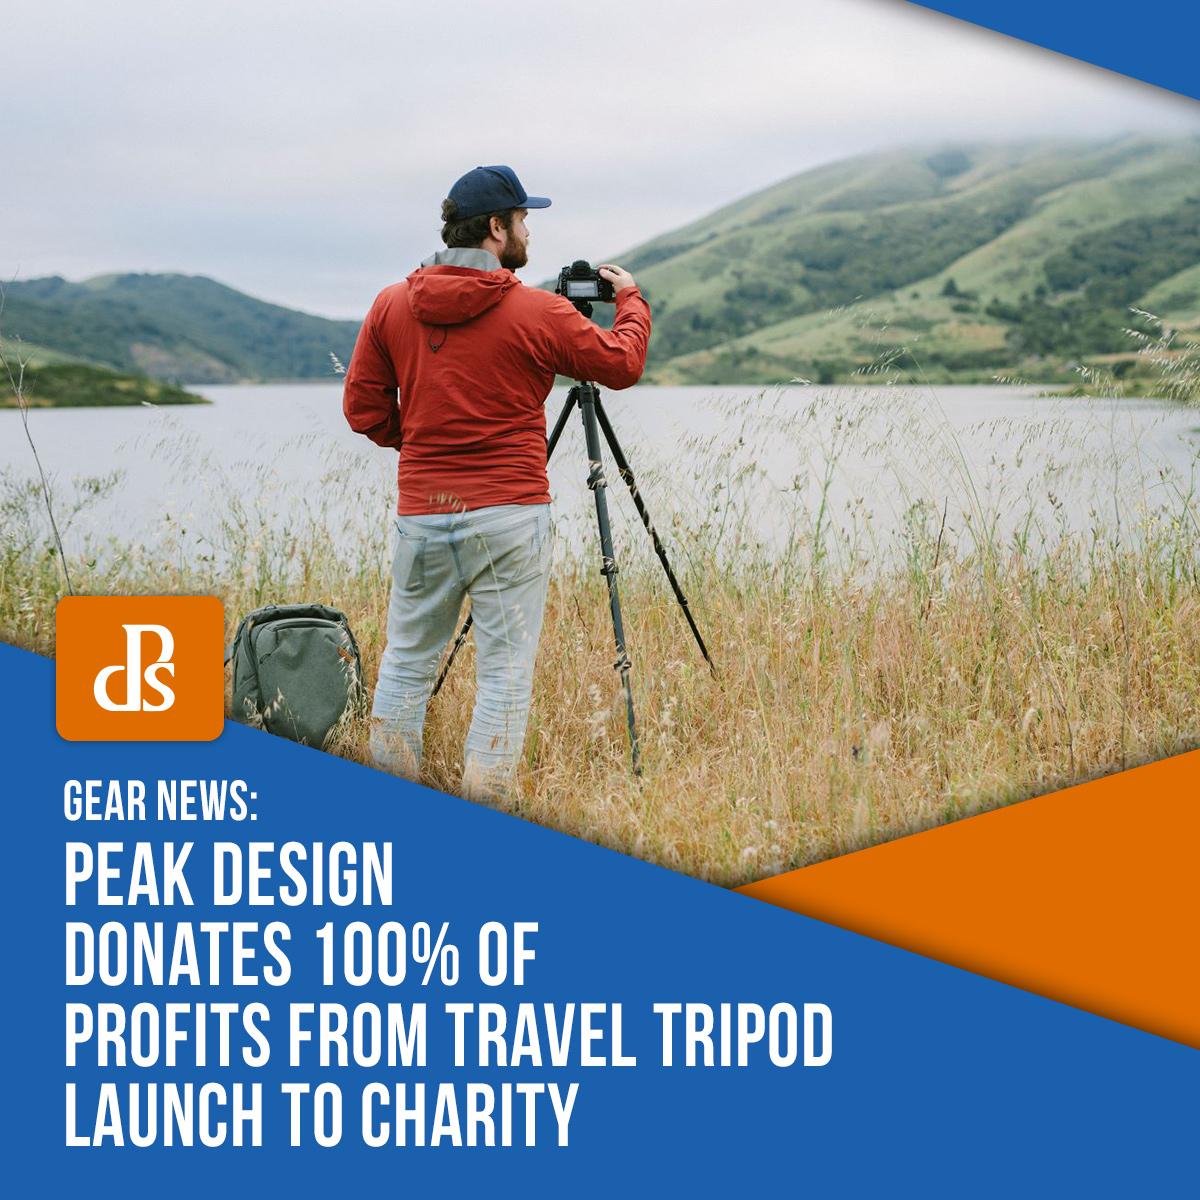 dps-news-peak-design-donates-profits